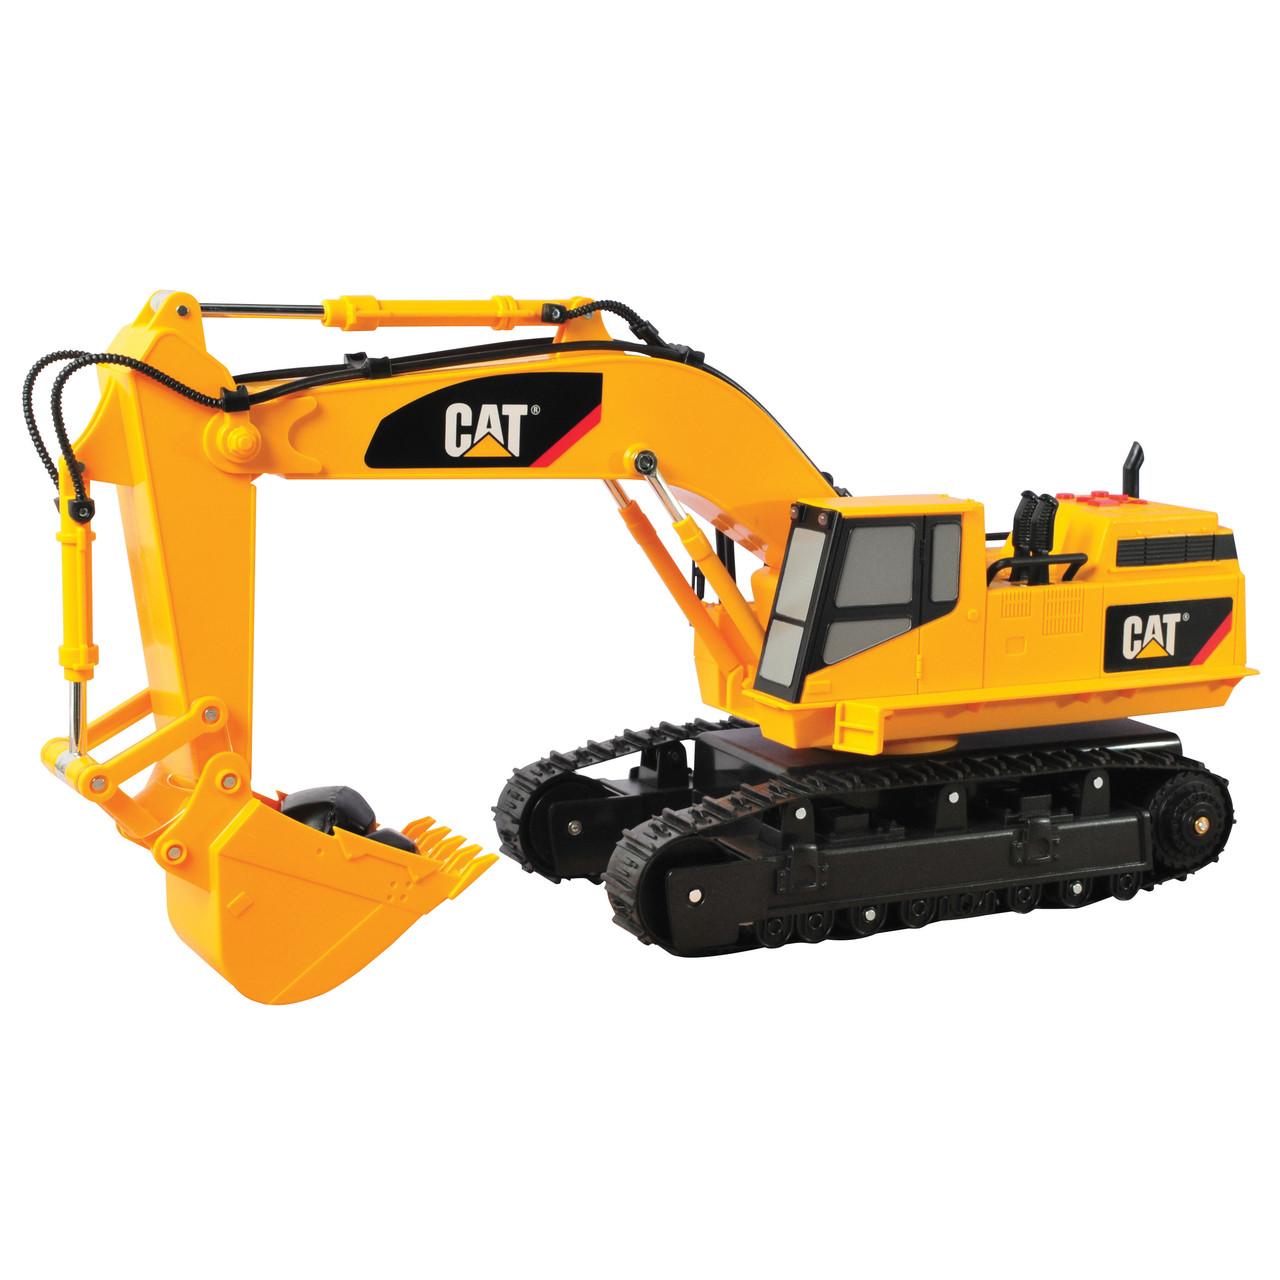 Экскаватор CAT, 51 см «Toy State» (34658)